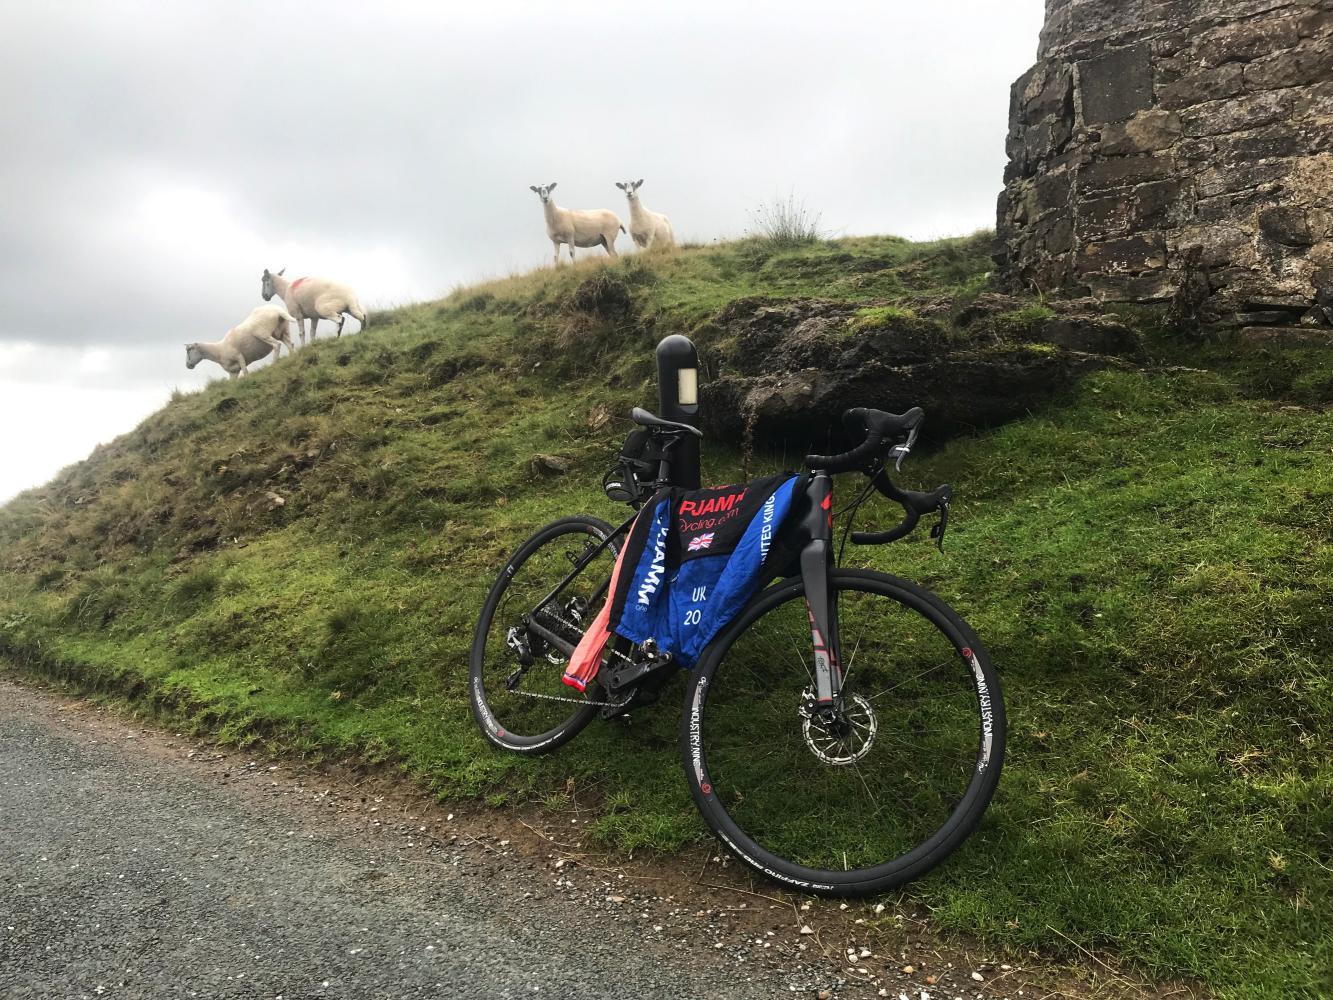 Nick 'O Pendle (SW #74) Bike Climb - PJAMM Cycling